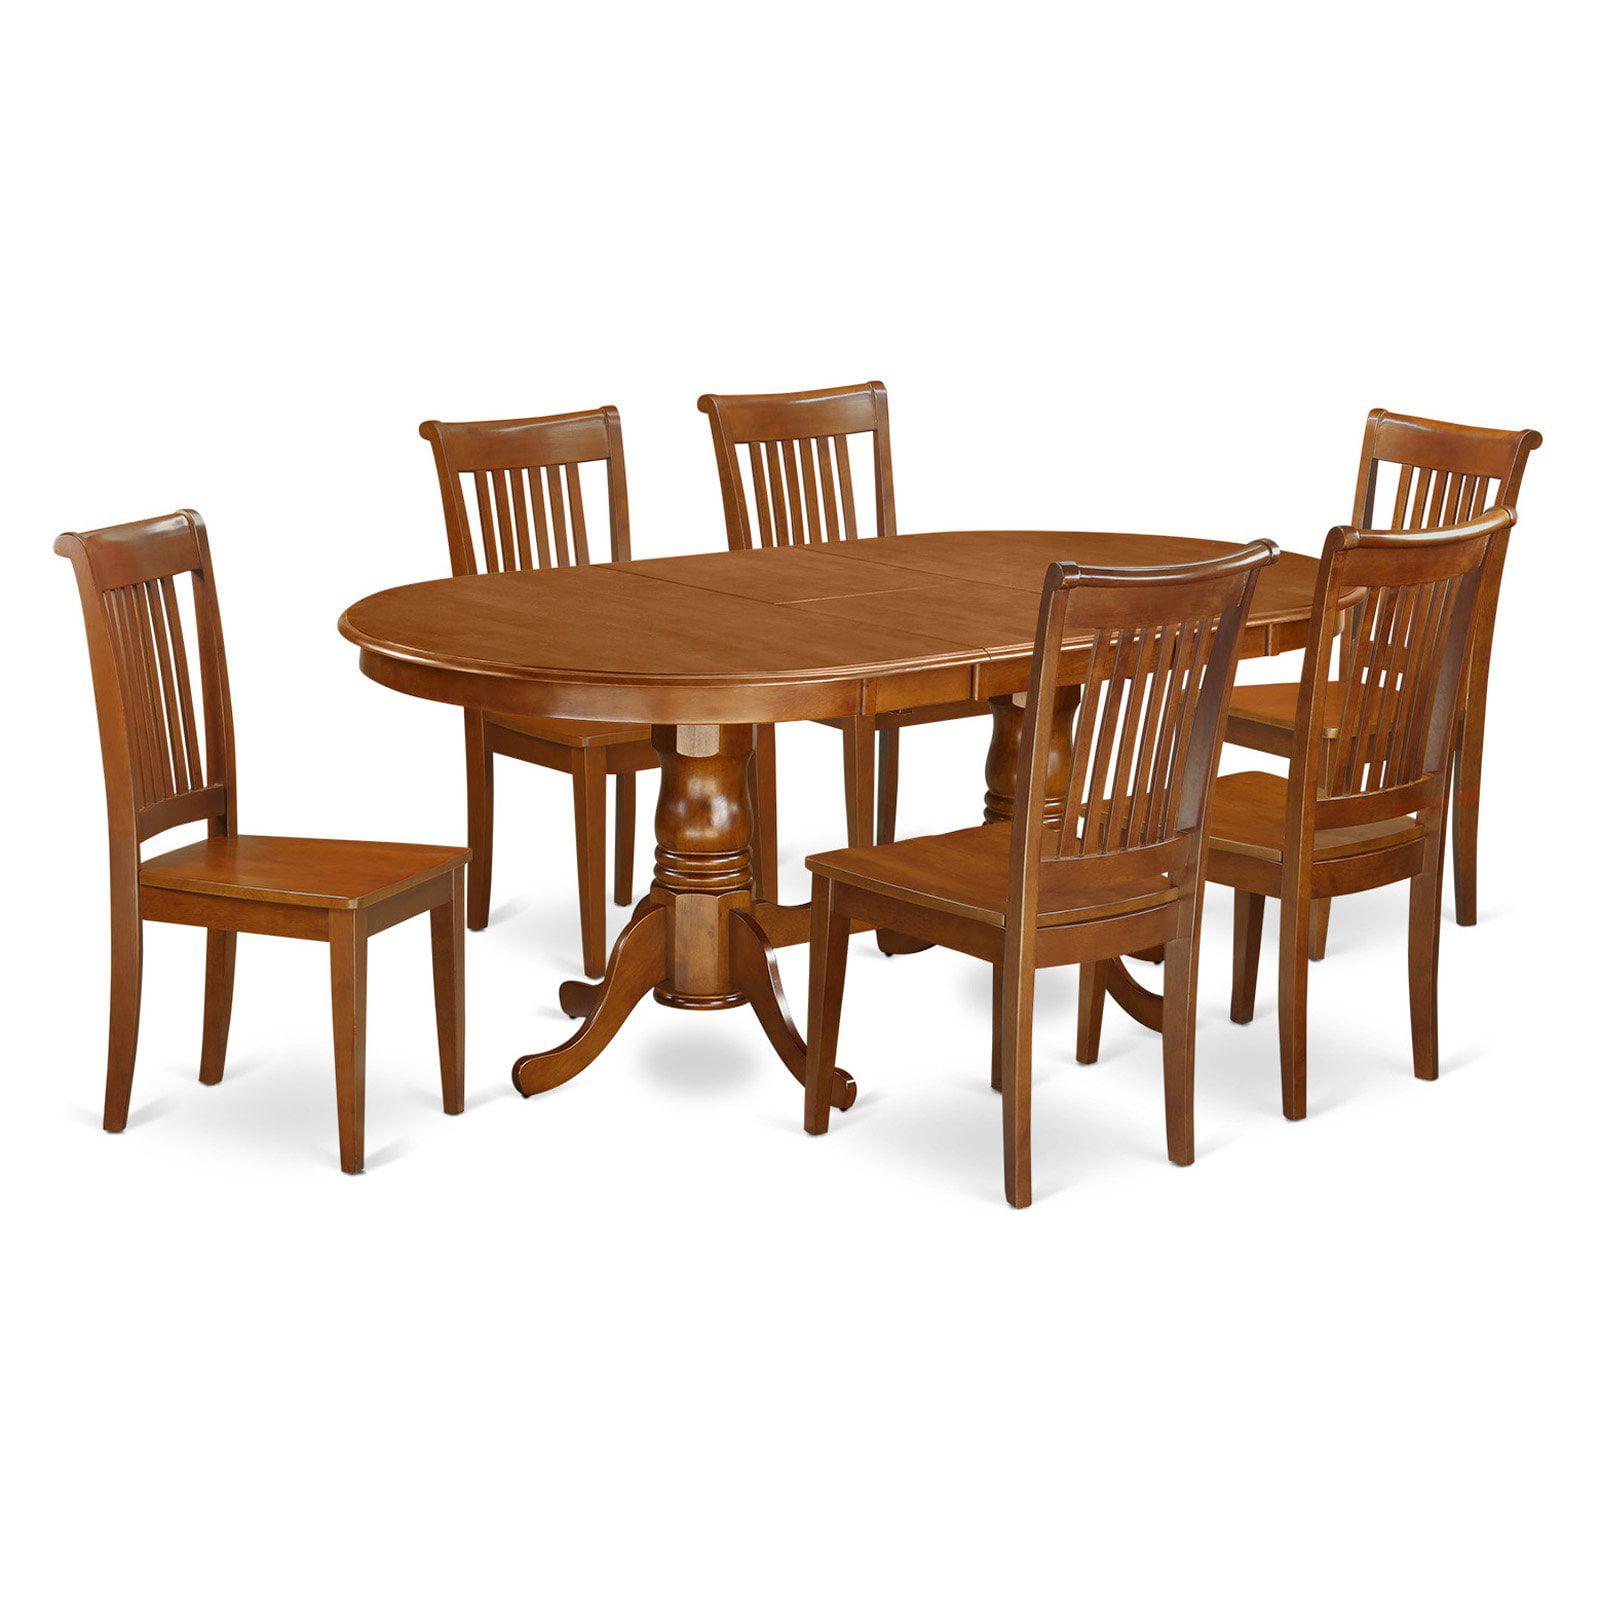 East West Furniture Plainville 7 Piece Windsor Dining Table Set